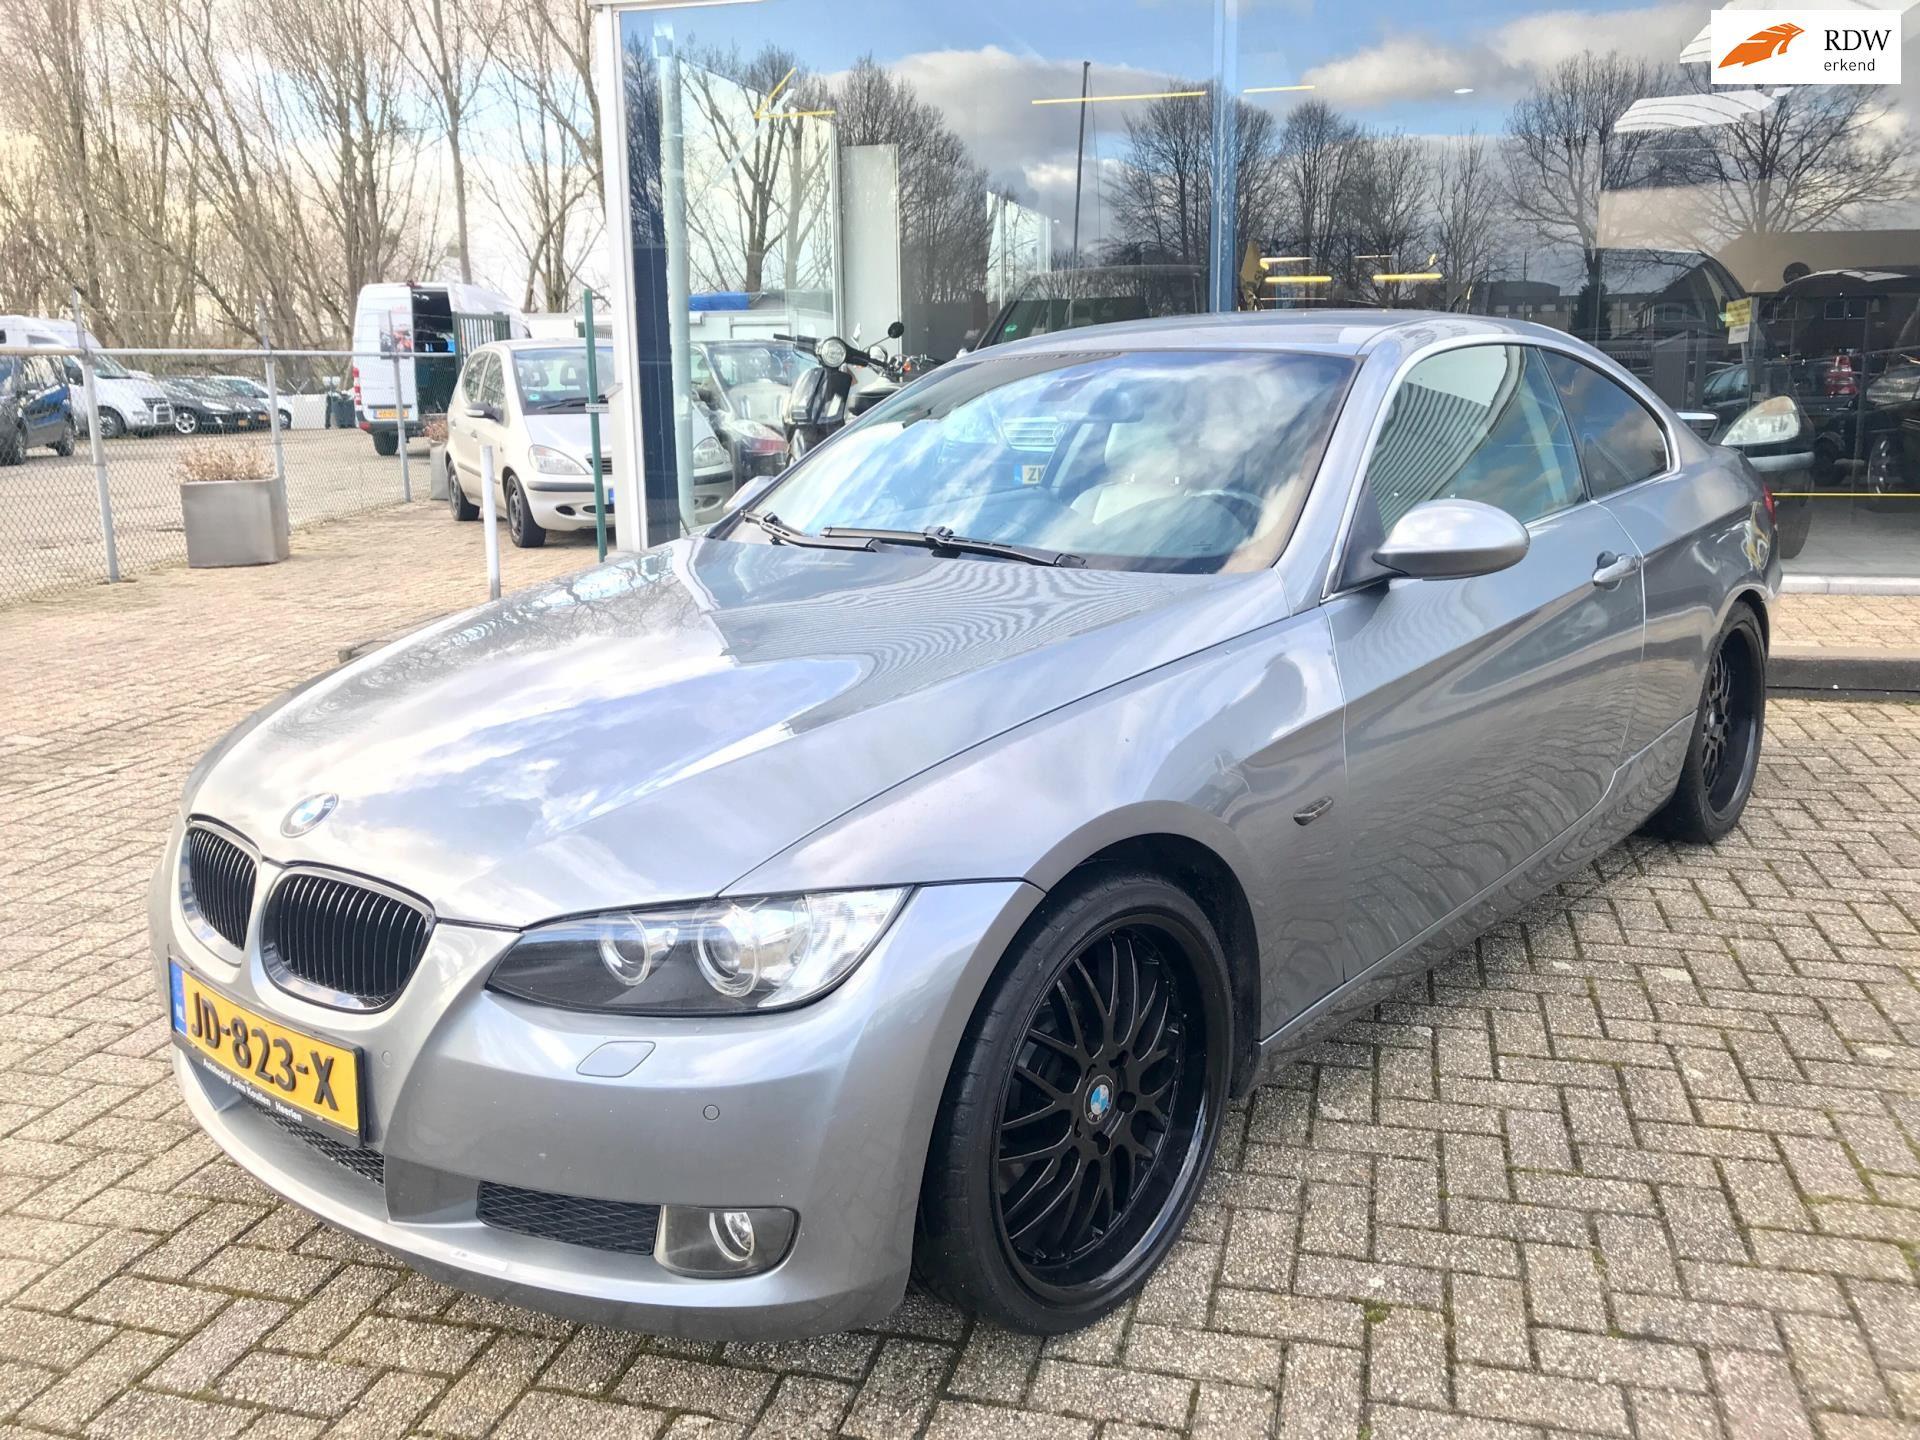 BMW 3-serie Coupé occasion - Autobedrijf John Koullen